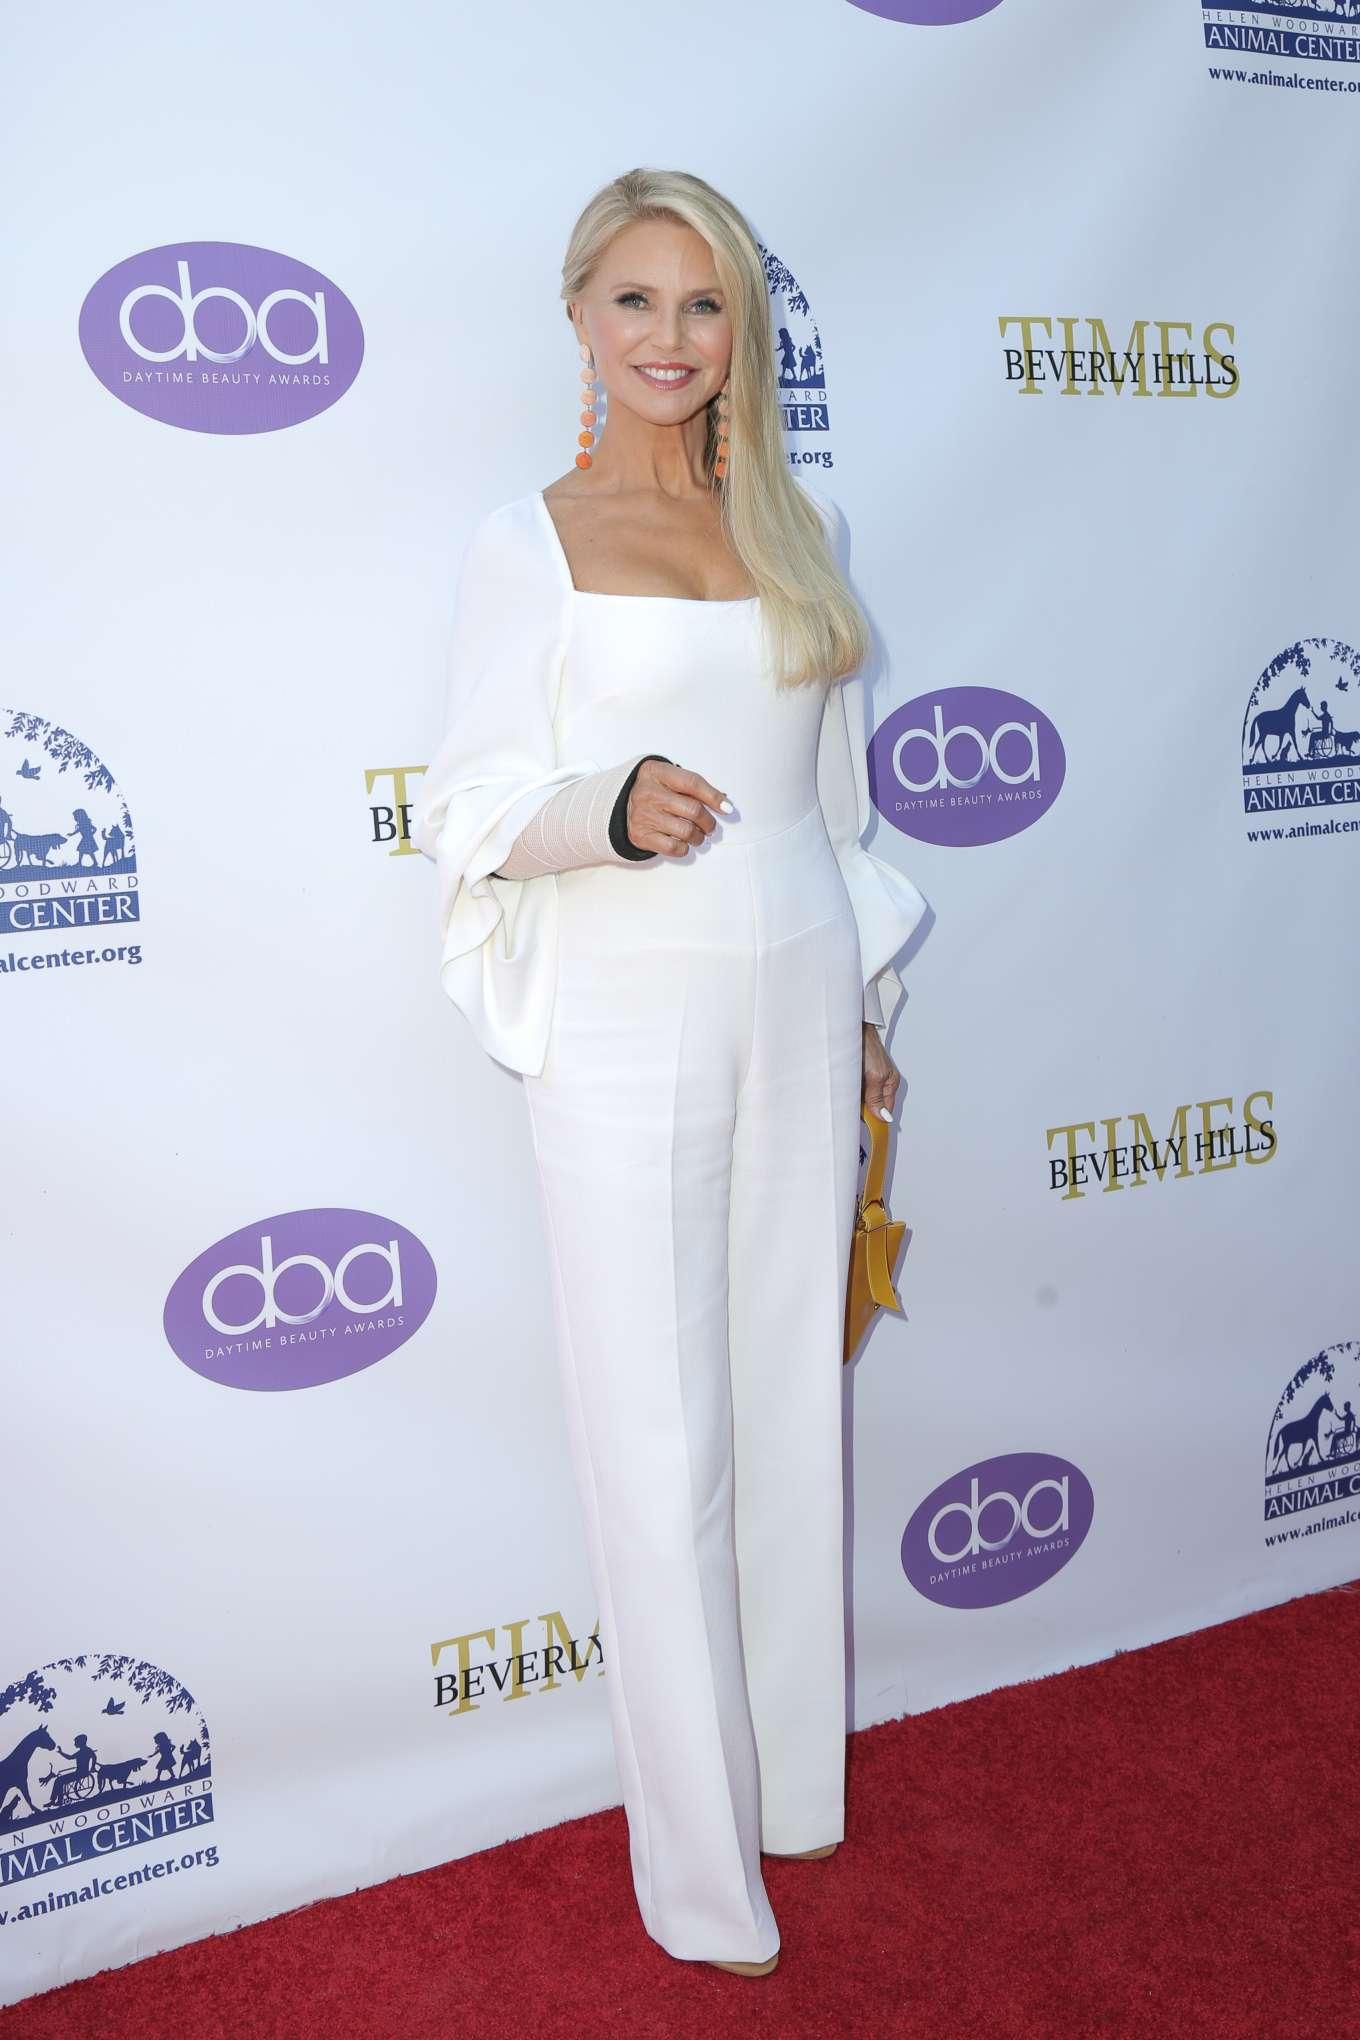 Christie Brinkley 2019 : Christie Brinkley – 2019 Beauty Awards-06